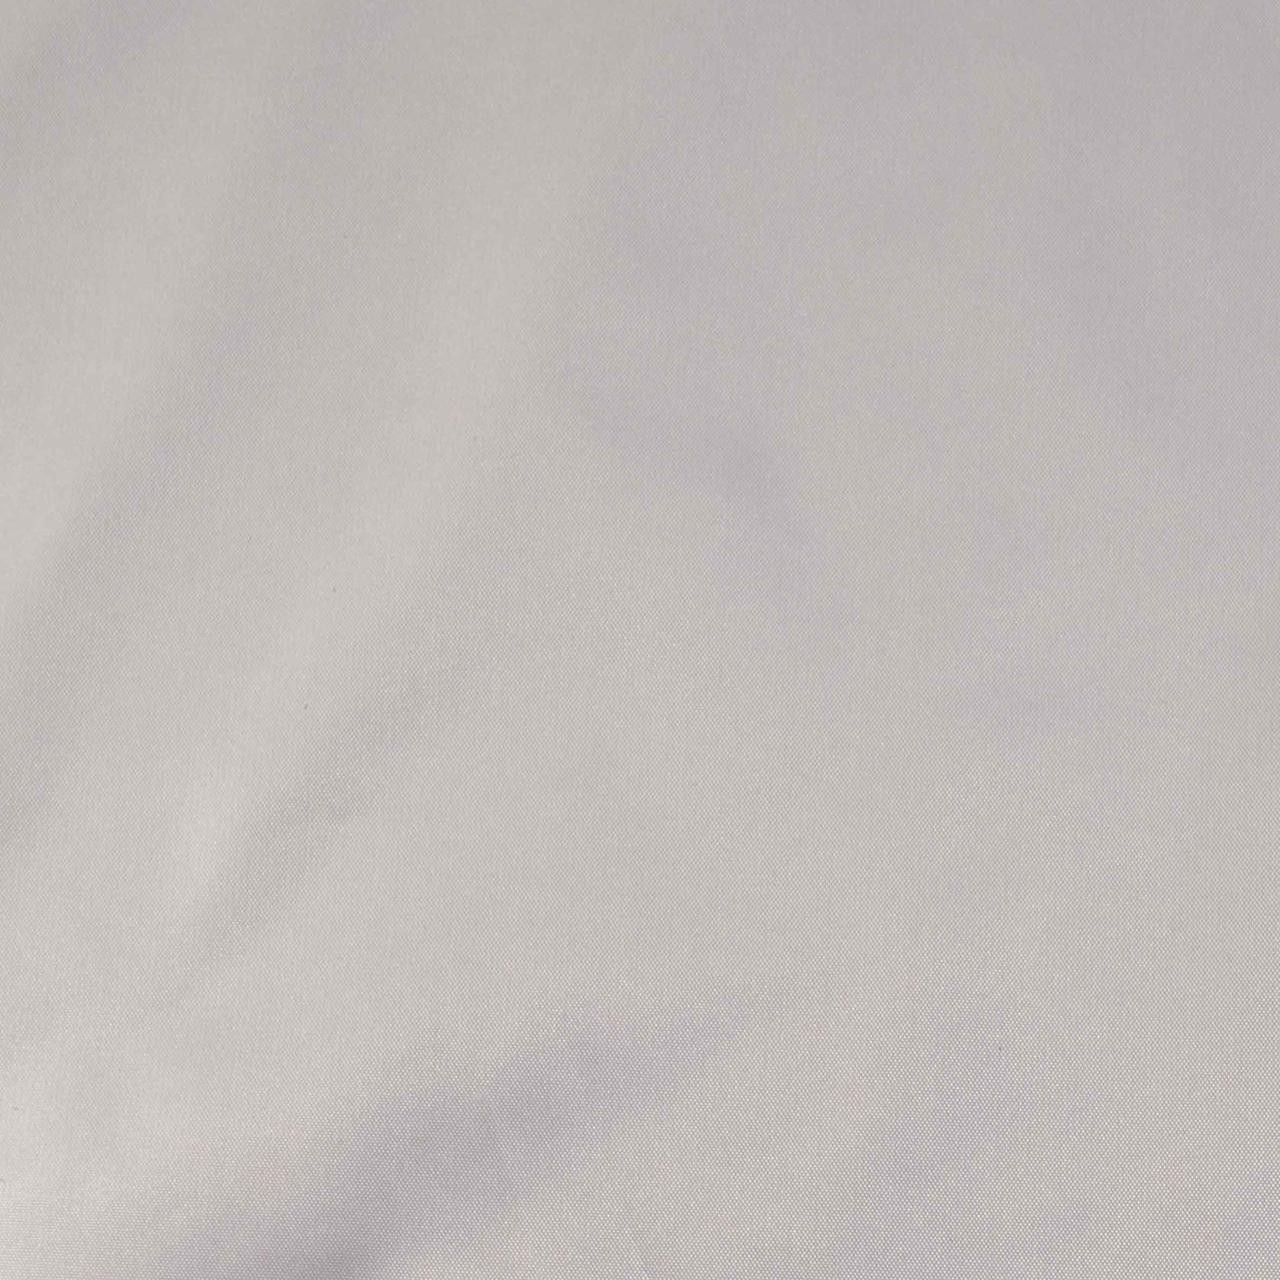 Ткань плащевка AА1 2020 16